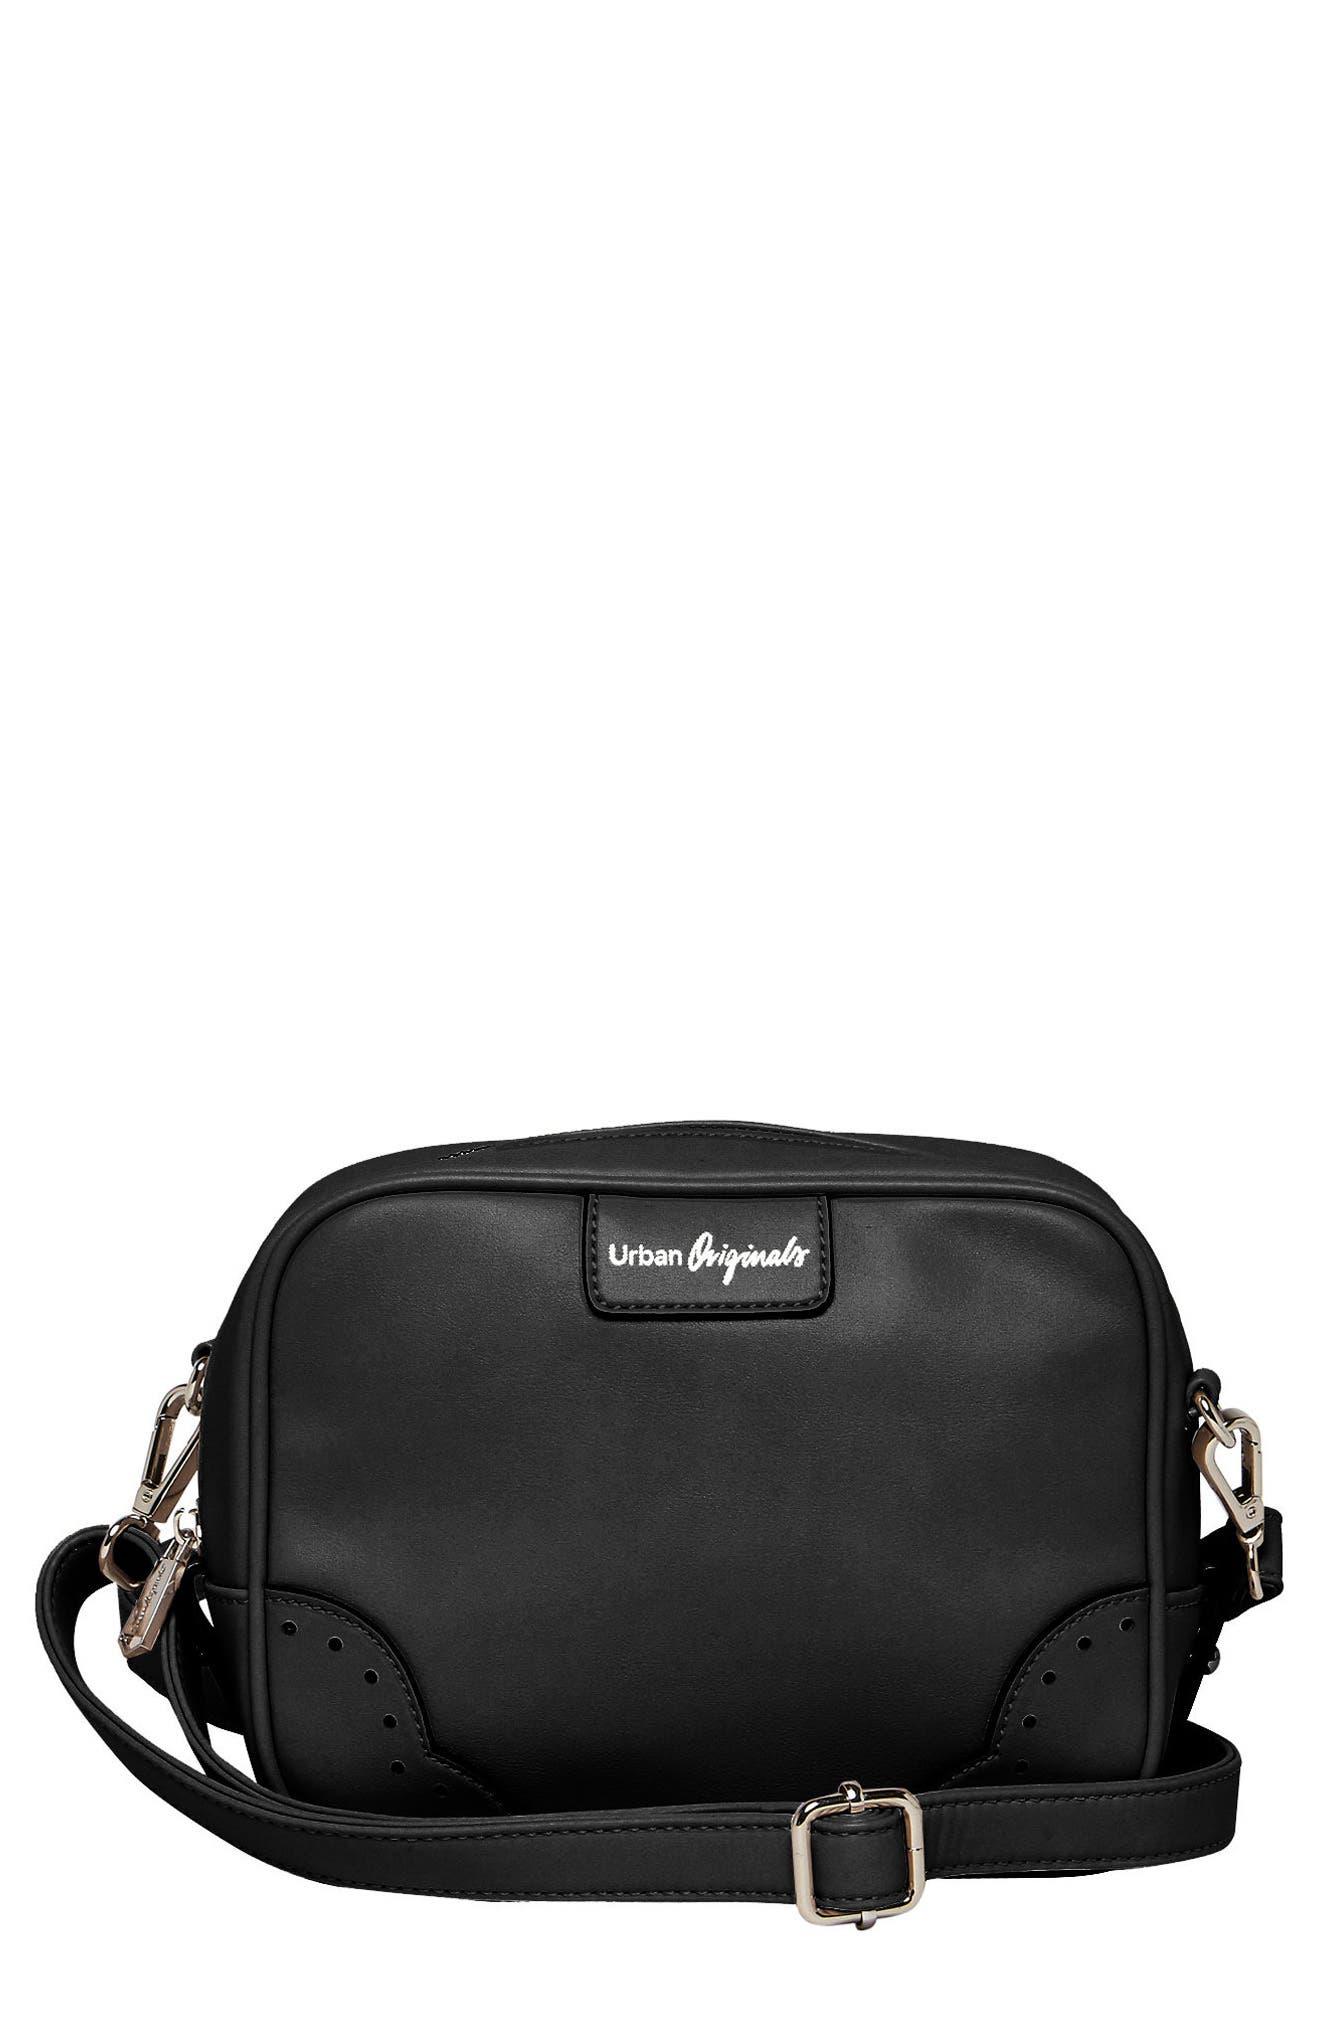 Splendour Vegan Leather Crossbody Bag,                             Main thumbnail 1, color,                             001